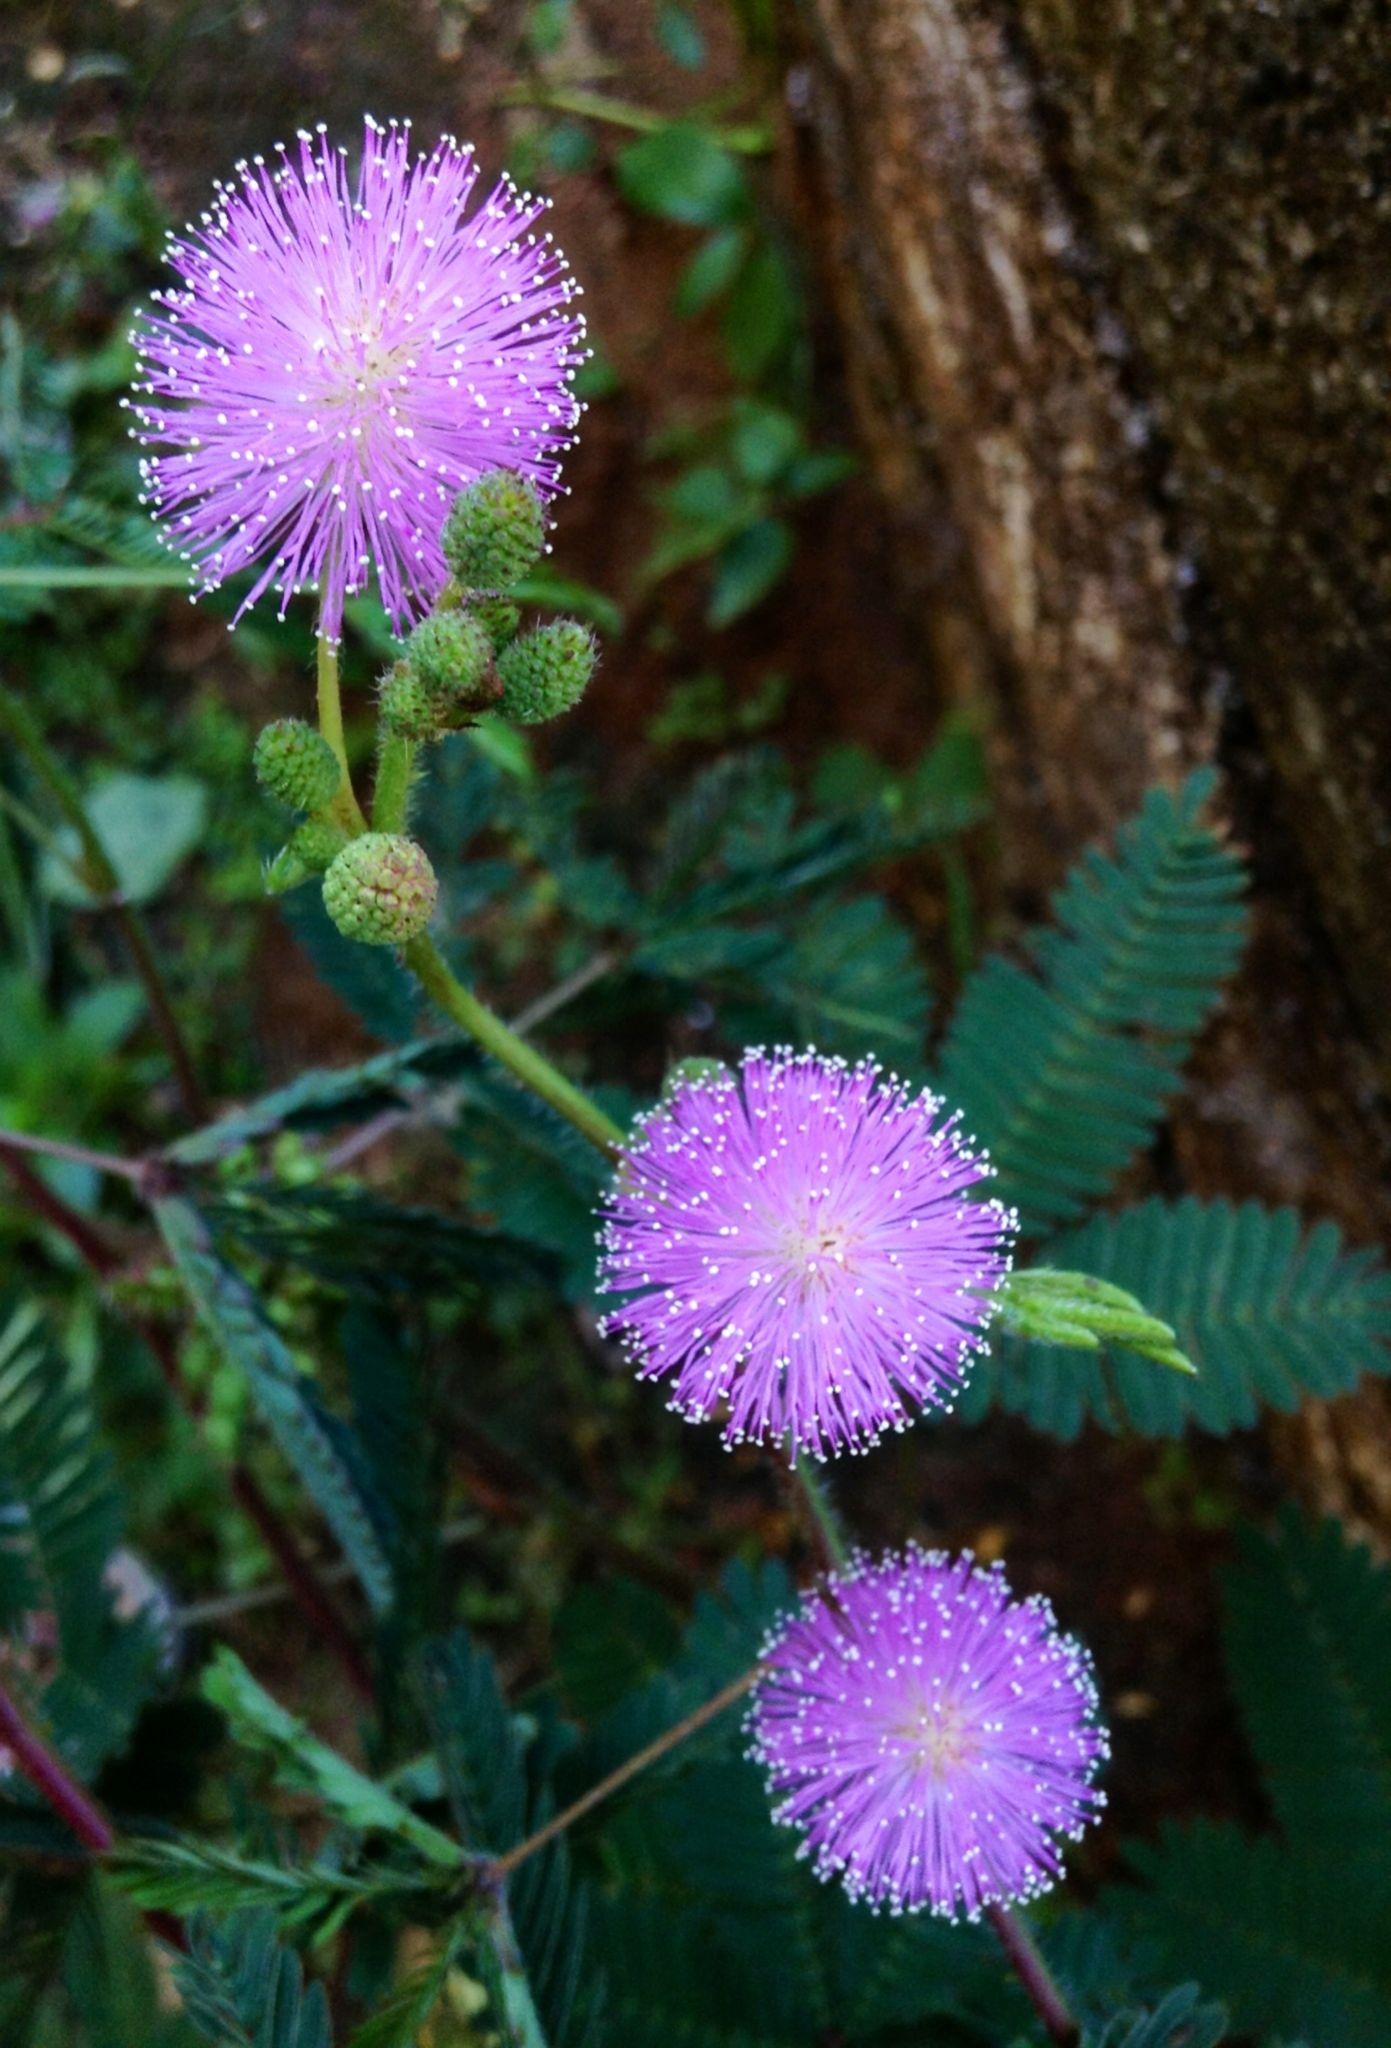 Shy Mimosa Pudica (Sensitive Plant) by Dickson Shia